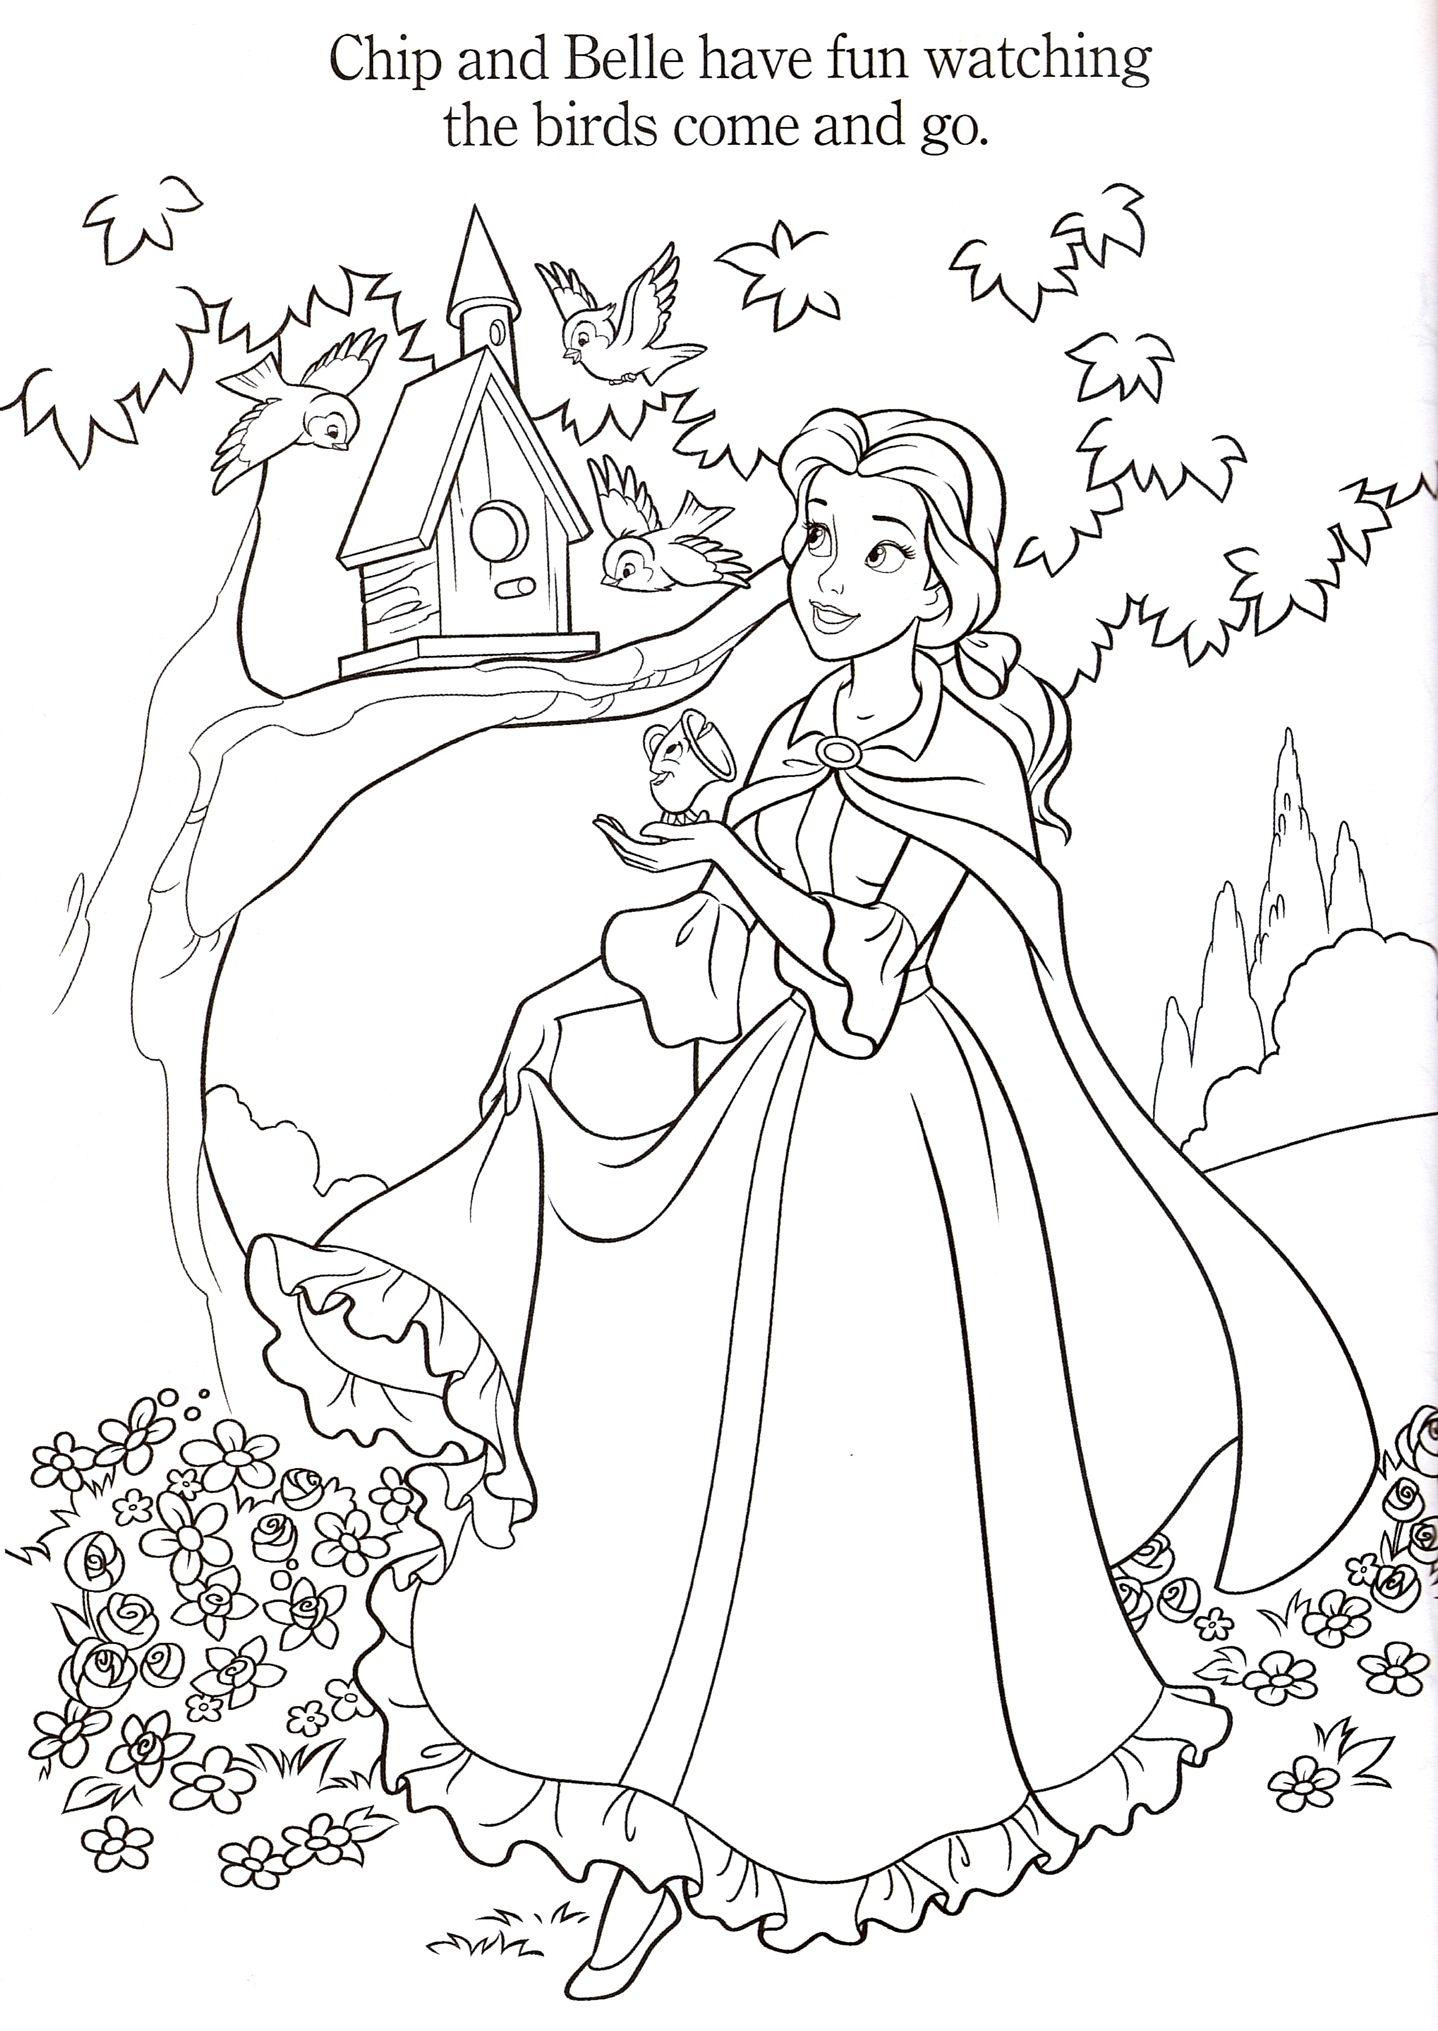 Http Www Oasidelleanime Com Minisiti Colorare Disney Princess Original9 Princip Disney Princess Coloring Pages Princess Coloring Pages Disney Princess Colors